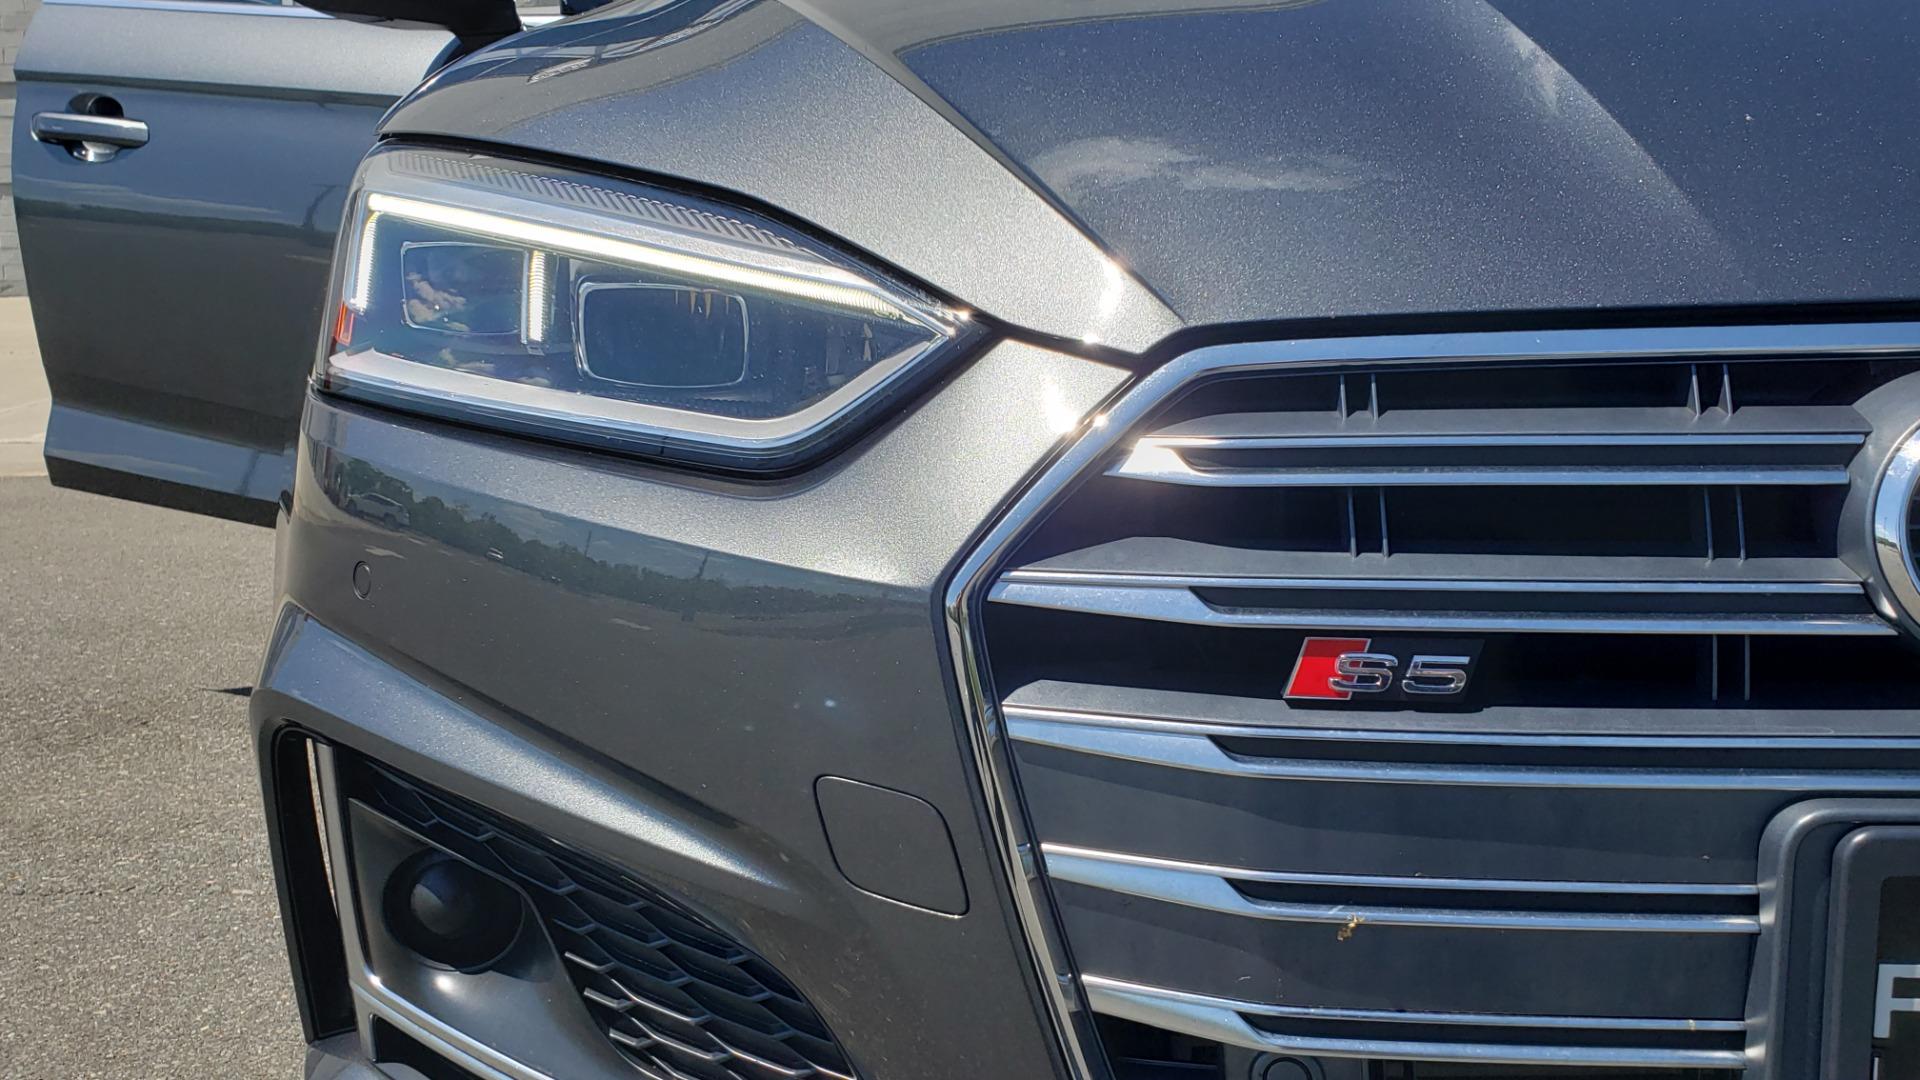 Used 2018 Audi S5 SPORTBACK PRESTIGE S-SPORT / NAV / SUNROOF / HUD / B&O SND / REARVIEW for sale $48,995 at Formula Imports in Charlotte NC 28227 22